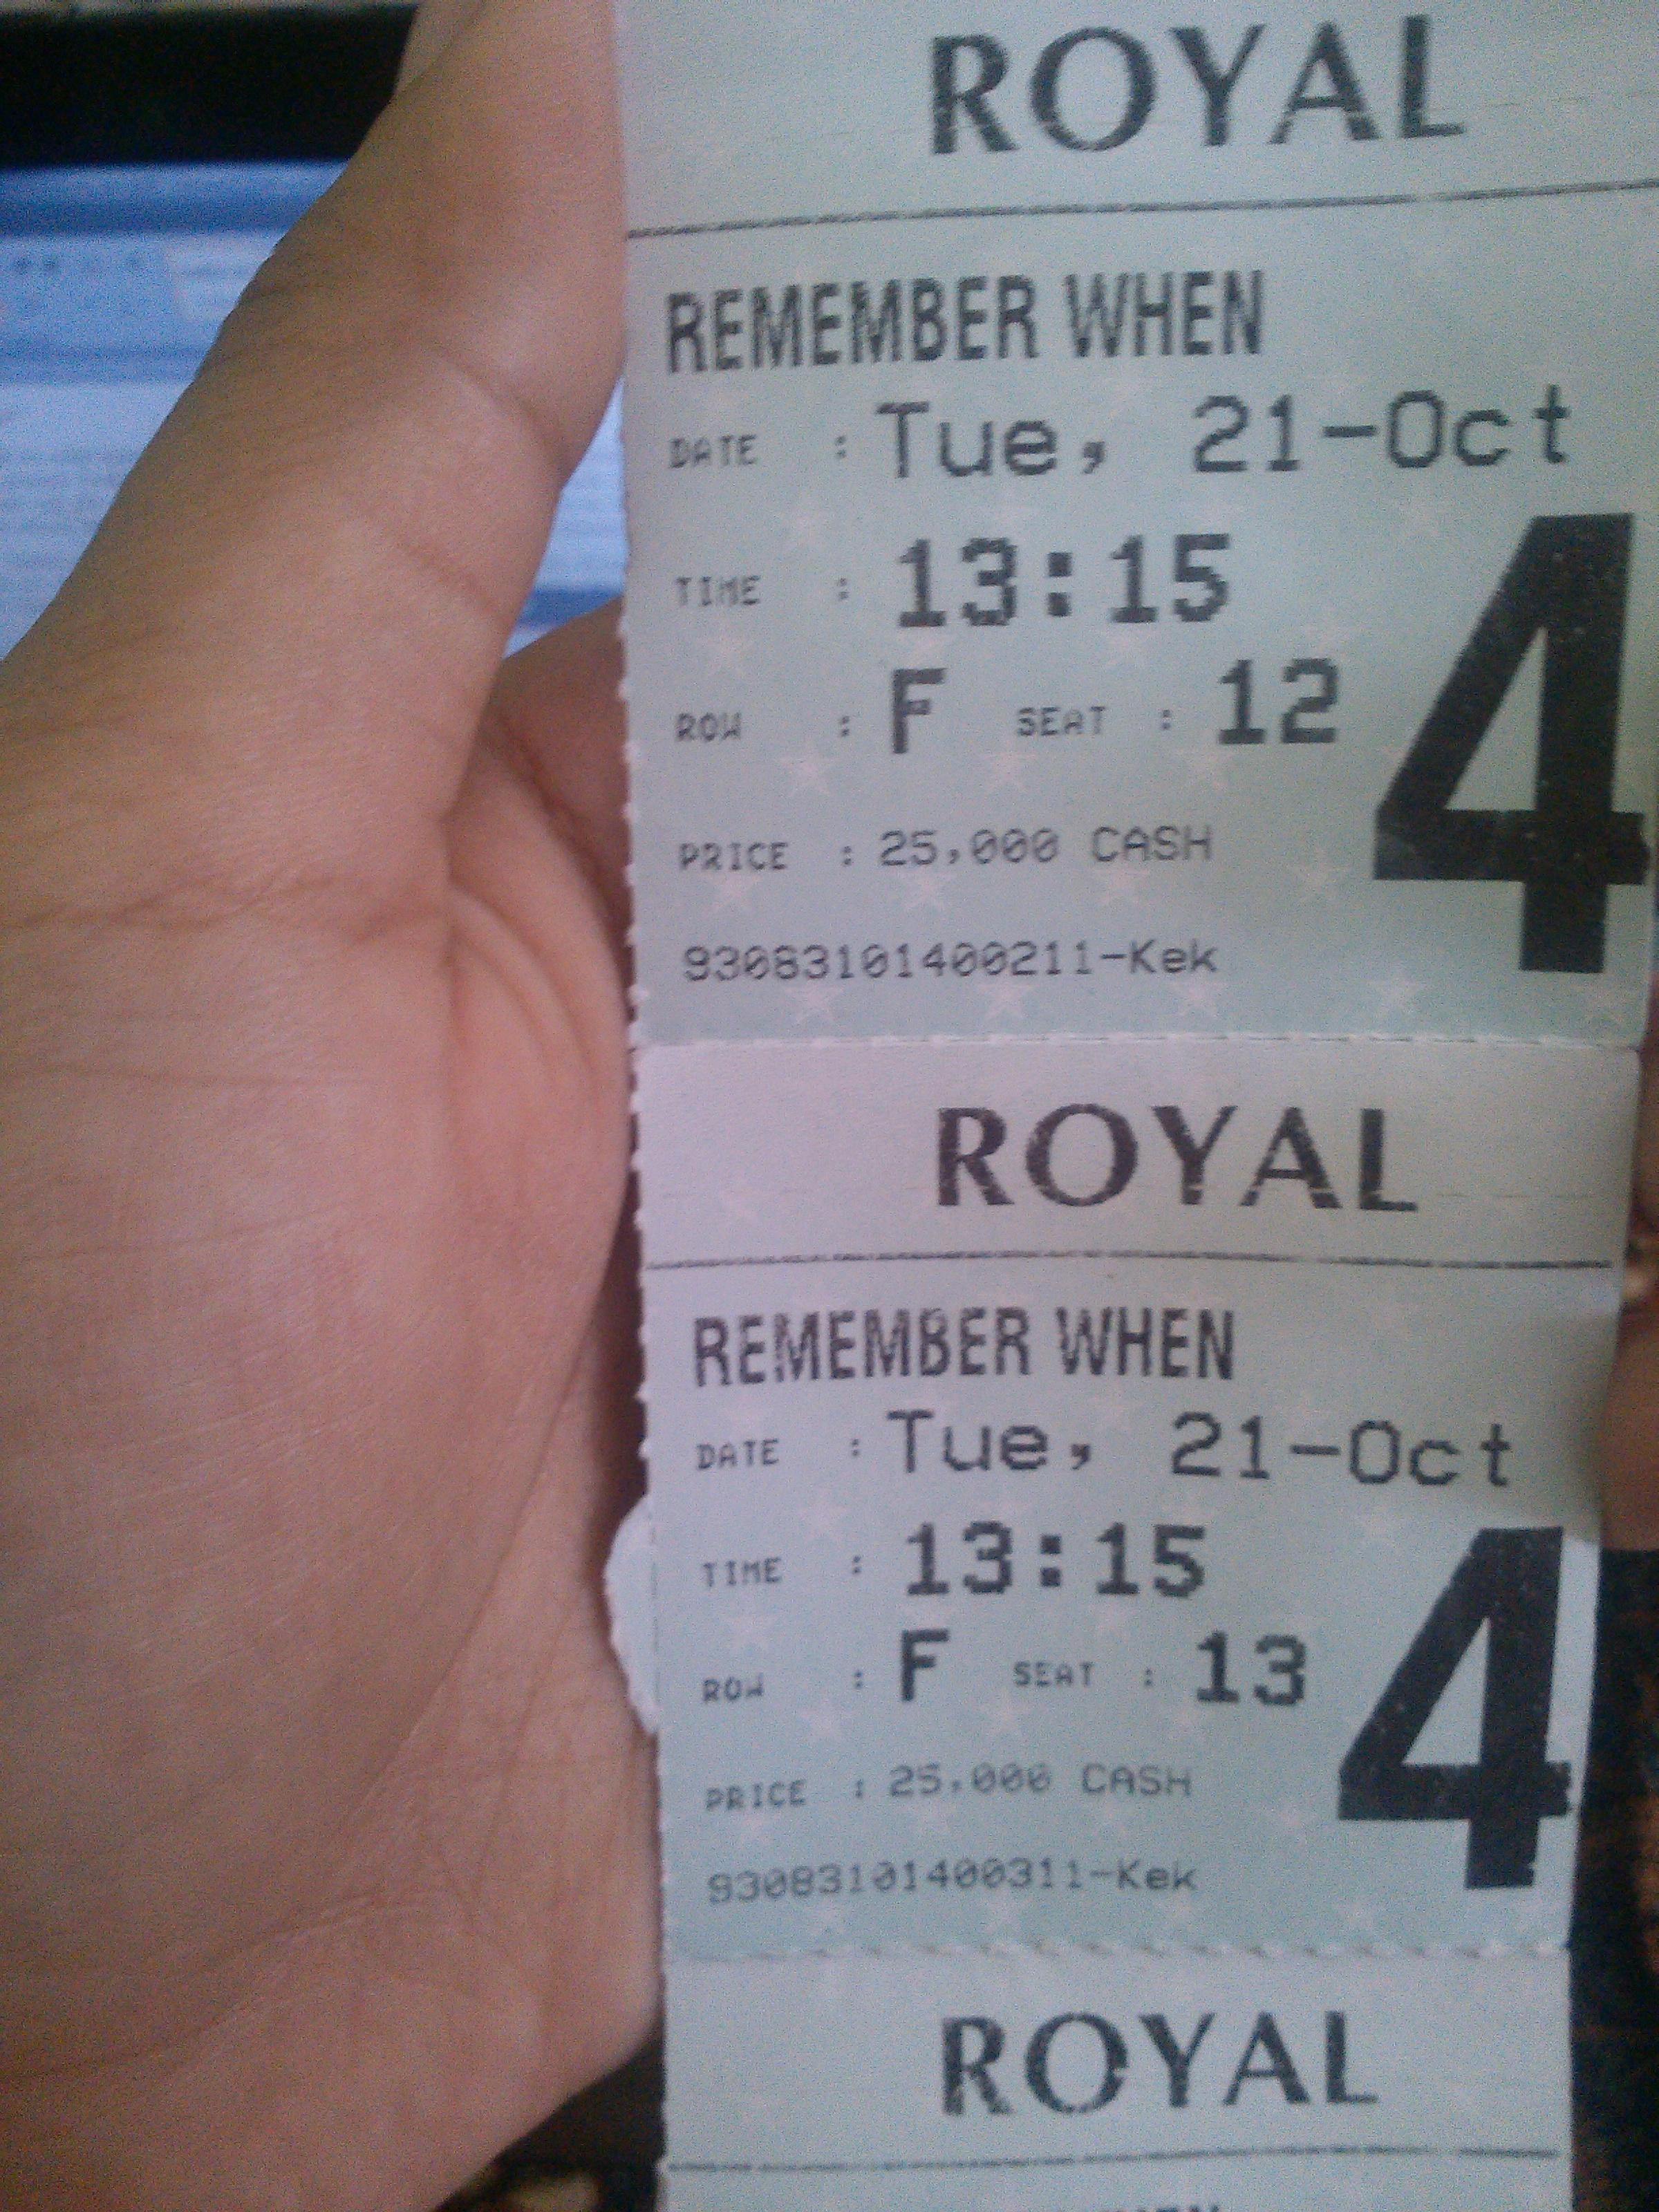 Jadwal Bioskop Royal : jadwal, bioskop, royal, Jadwal, Bioskop, Royal, Surabaya, What's